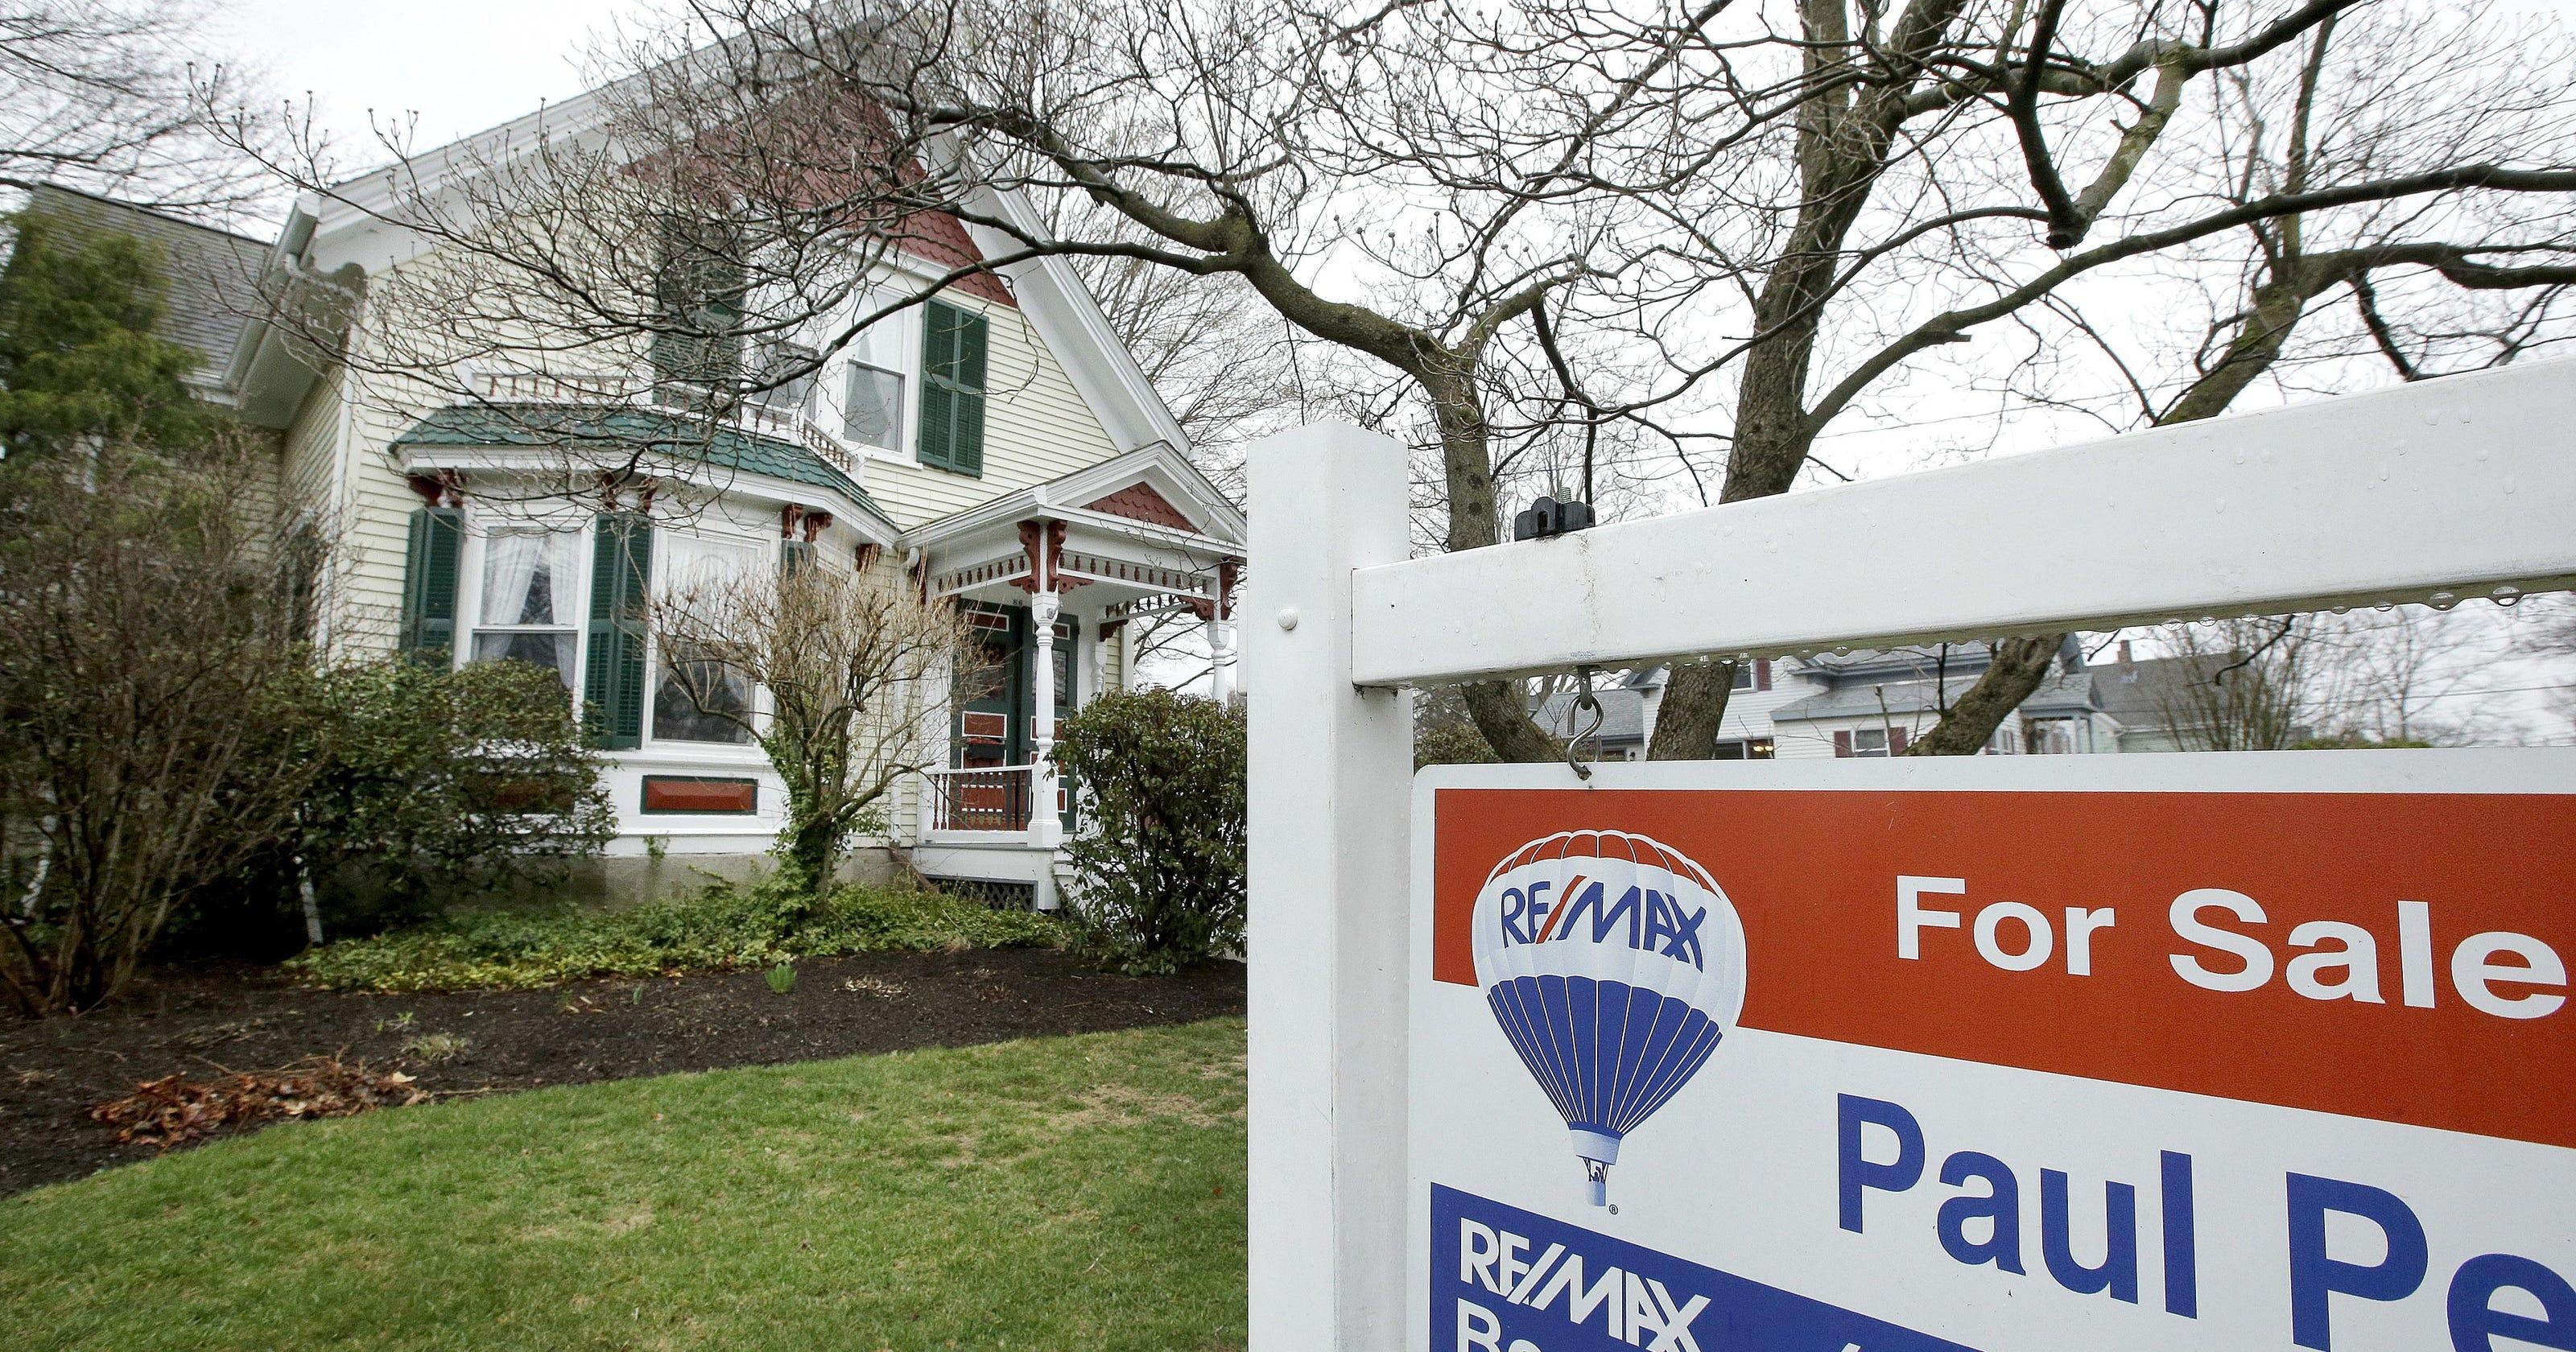 Regulator accuses Ocwen of failing millions of home borrowers